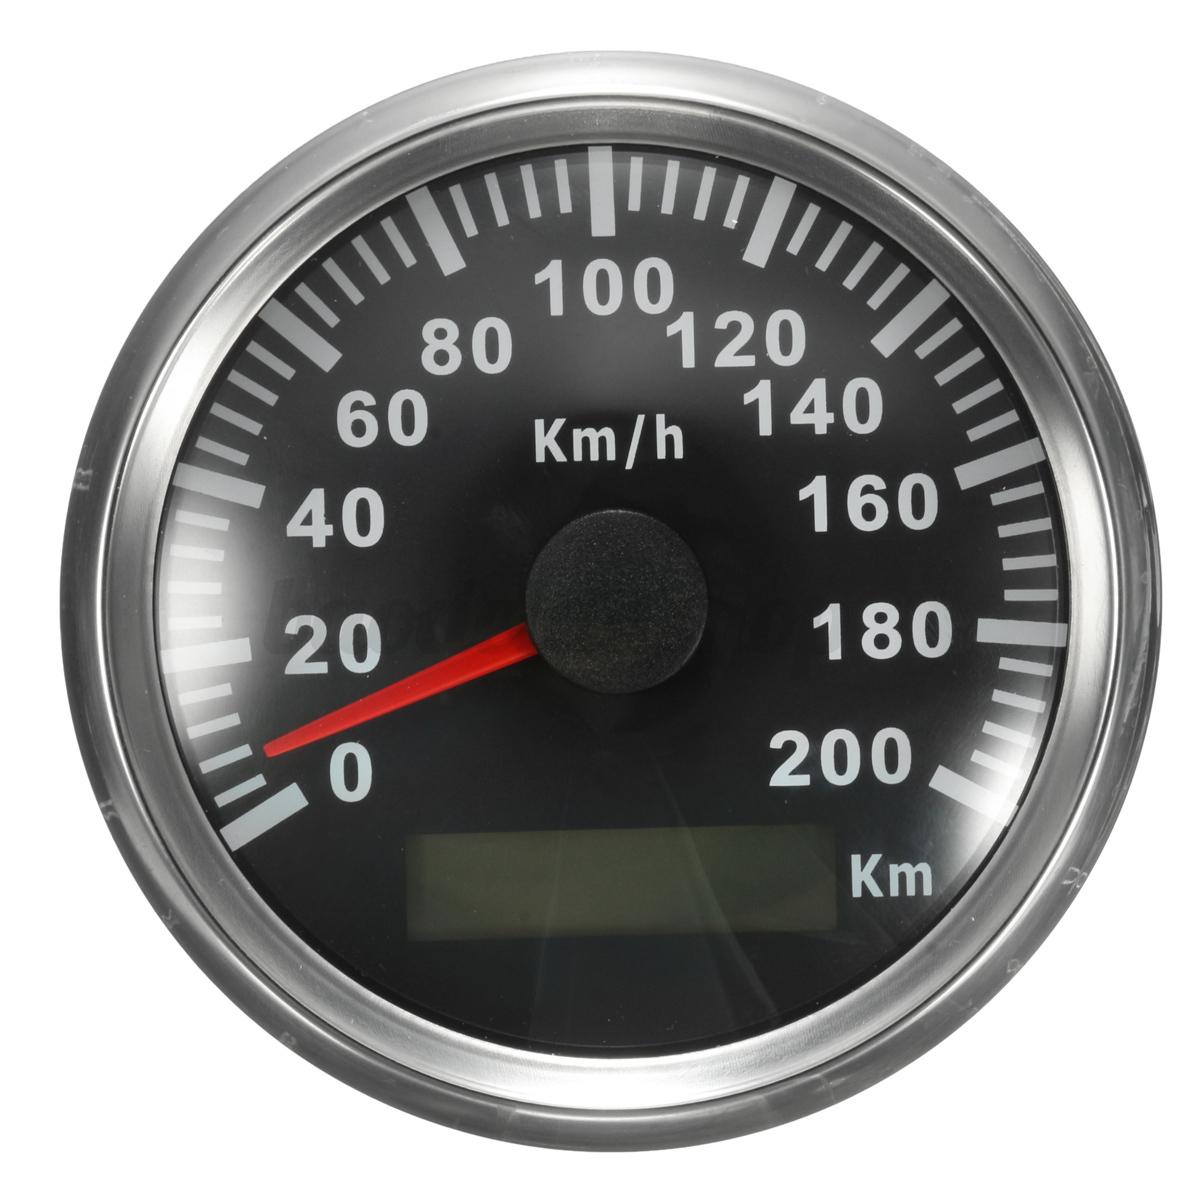 etanche 200km h voiture moto gps compteur vitesse digital. Black Bedroom Furniture Sets. Home Design Ideas